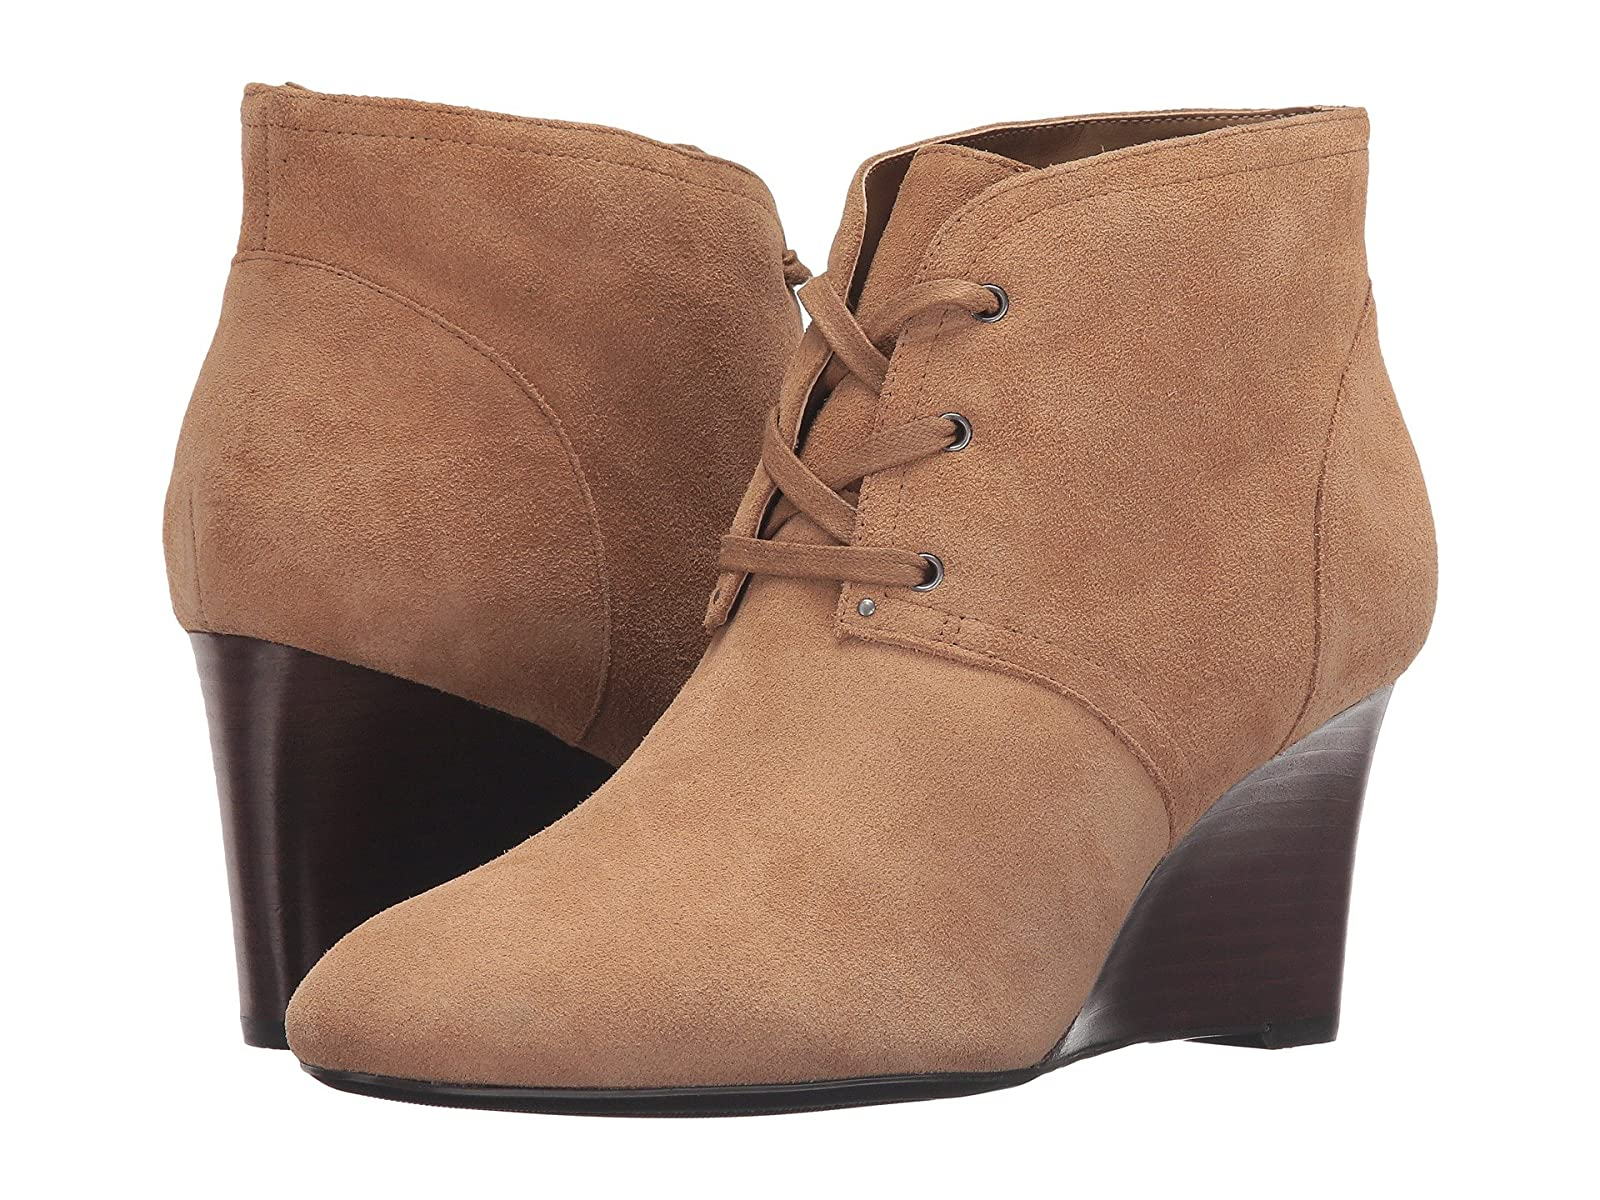 LAUREN Ralph Lauren TamiaCheap and distinctive eye-catching shoes